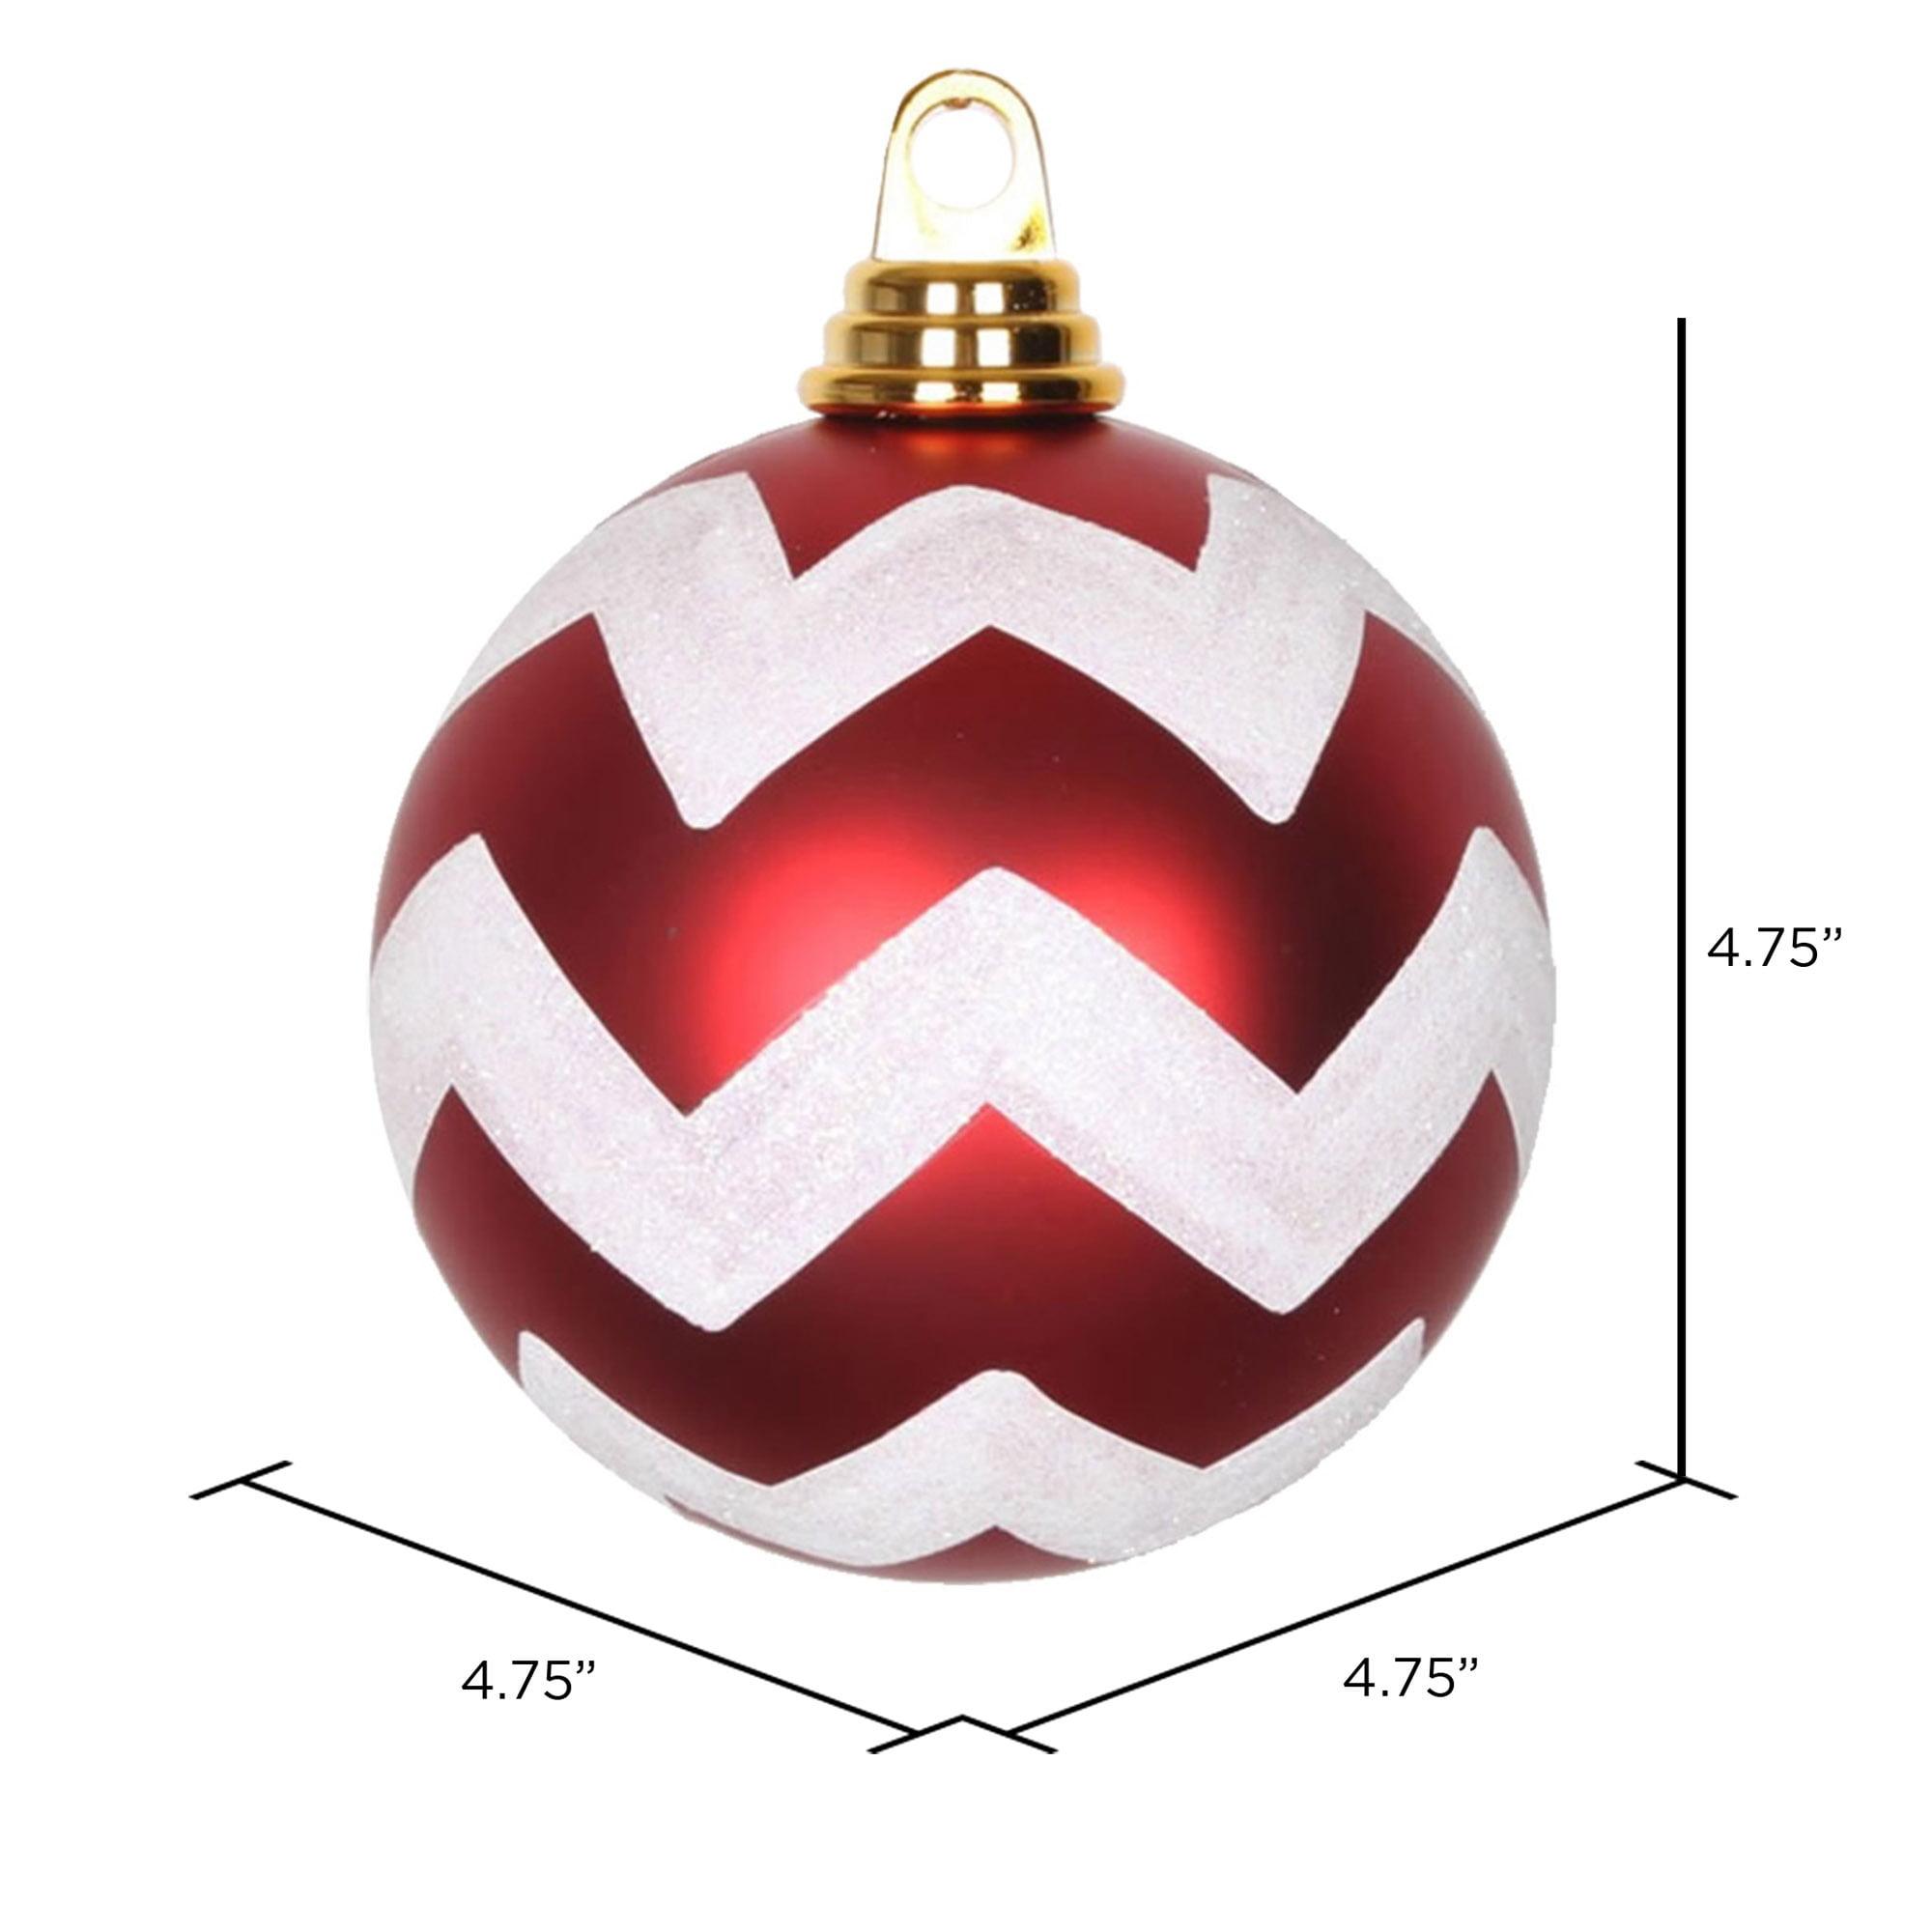 Vickerman 4 75 Matte Glitter Chevron Ball Christmas Ornaments Pack Of 3 Walmart Com Walmart Com